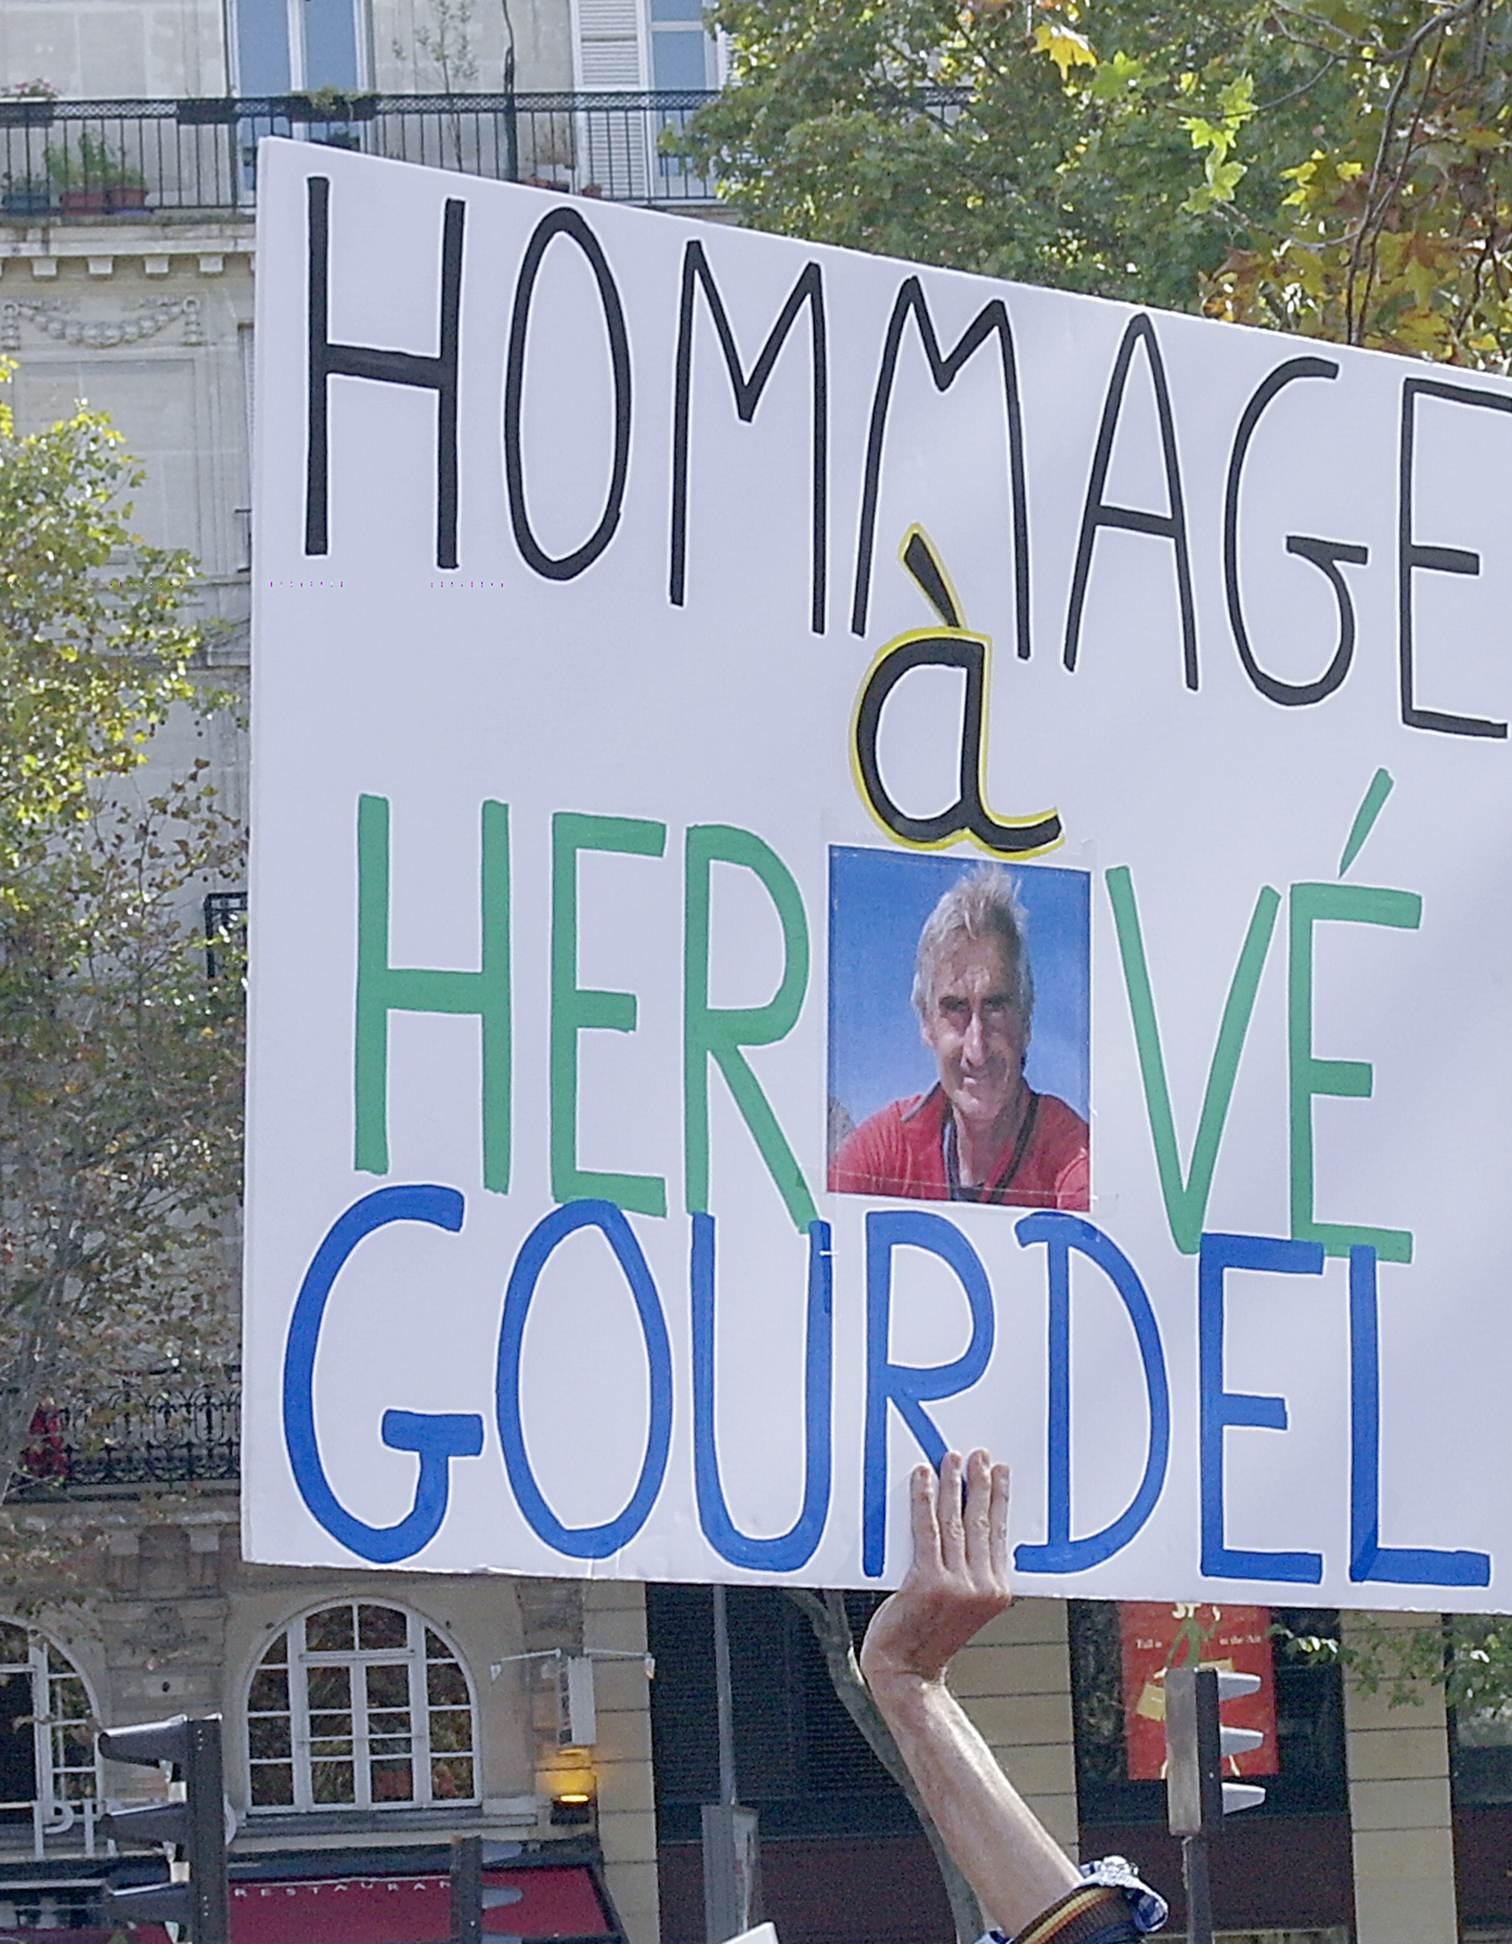 HOMMAGE A HERVE GOURDEL